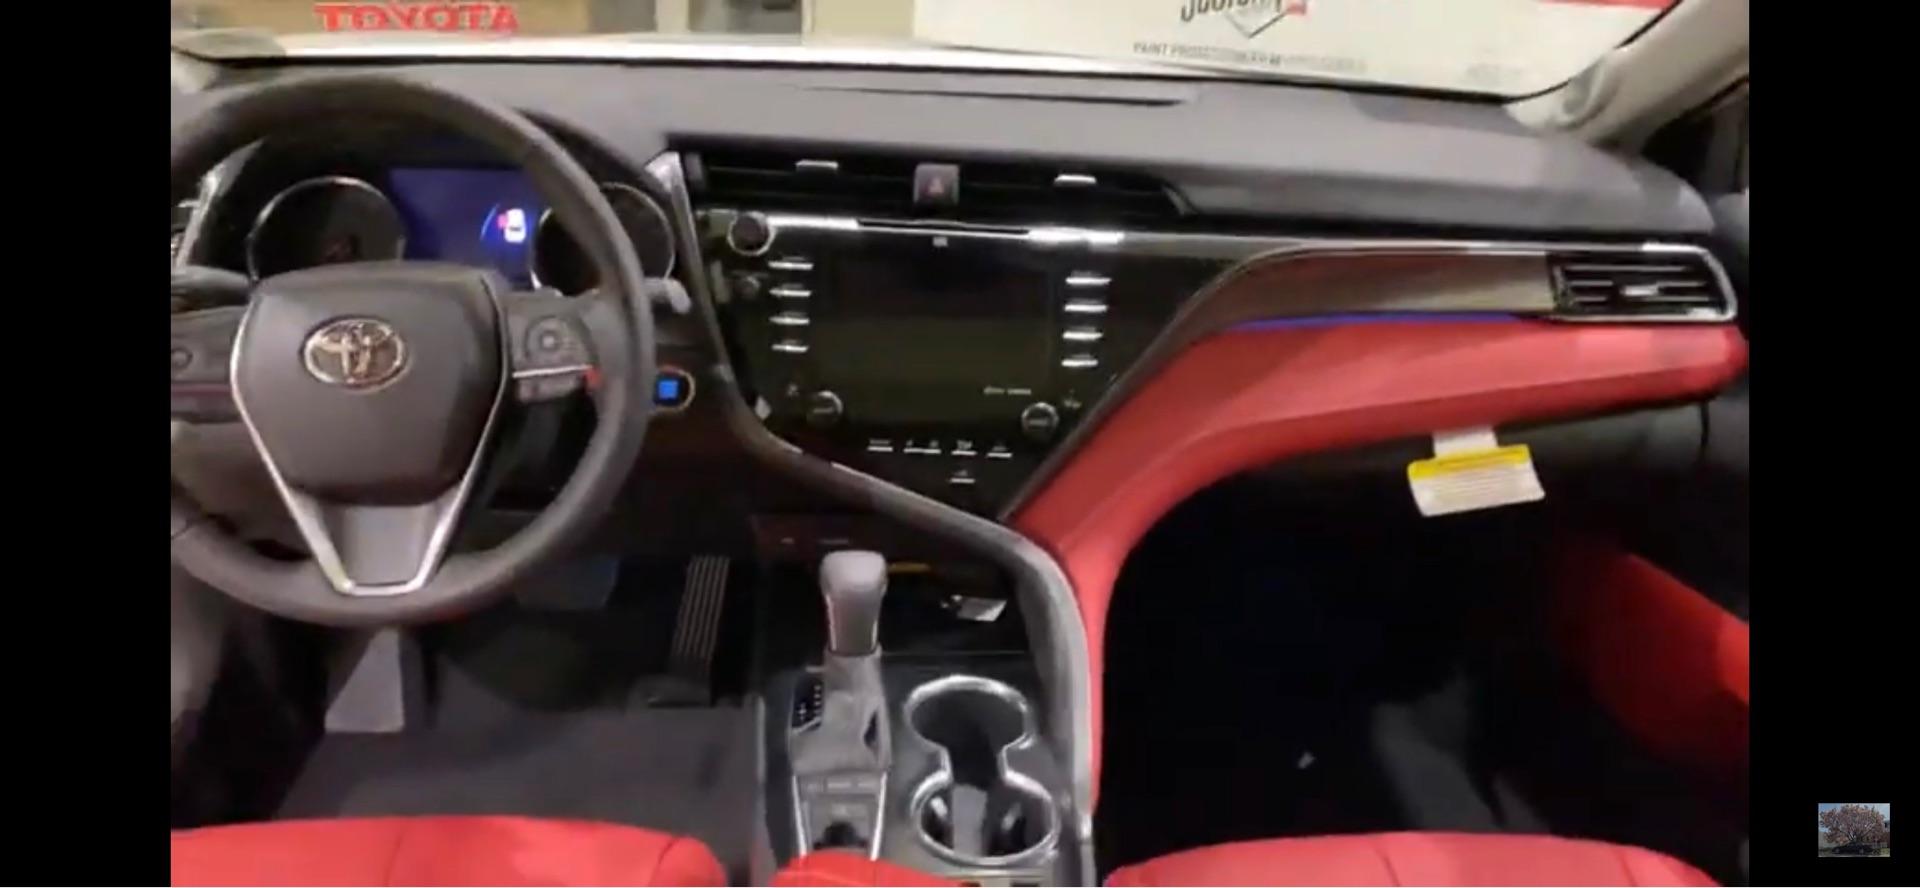 Toyota Camry - photo 2